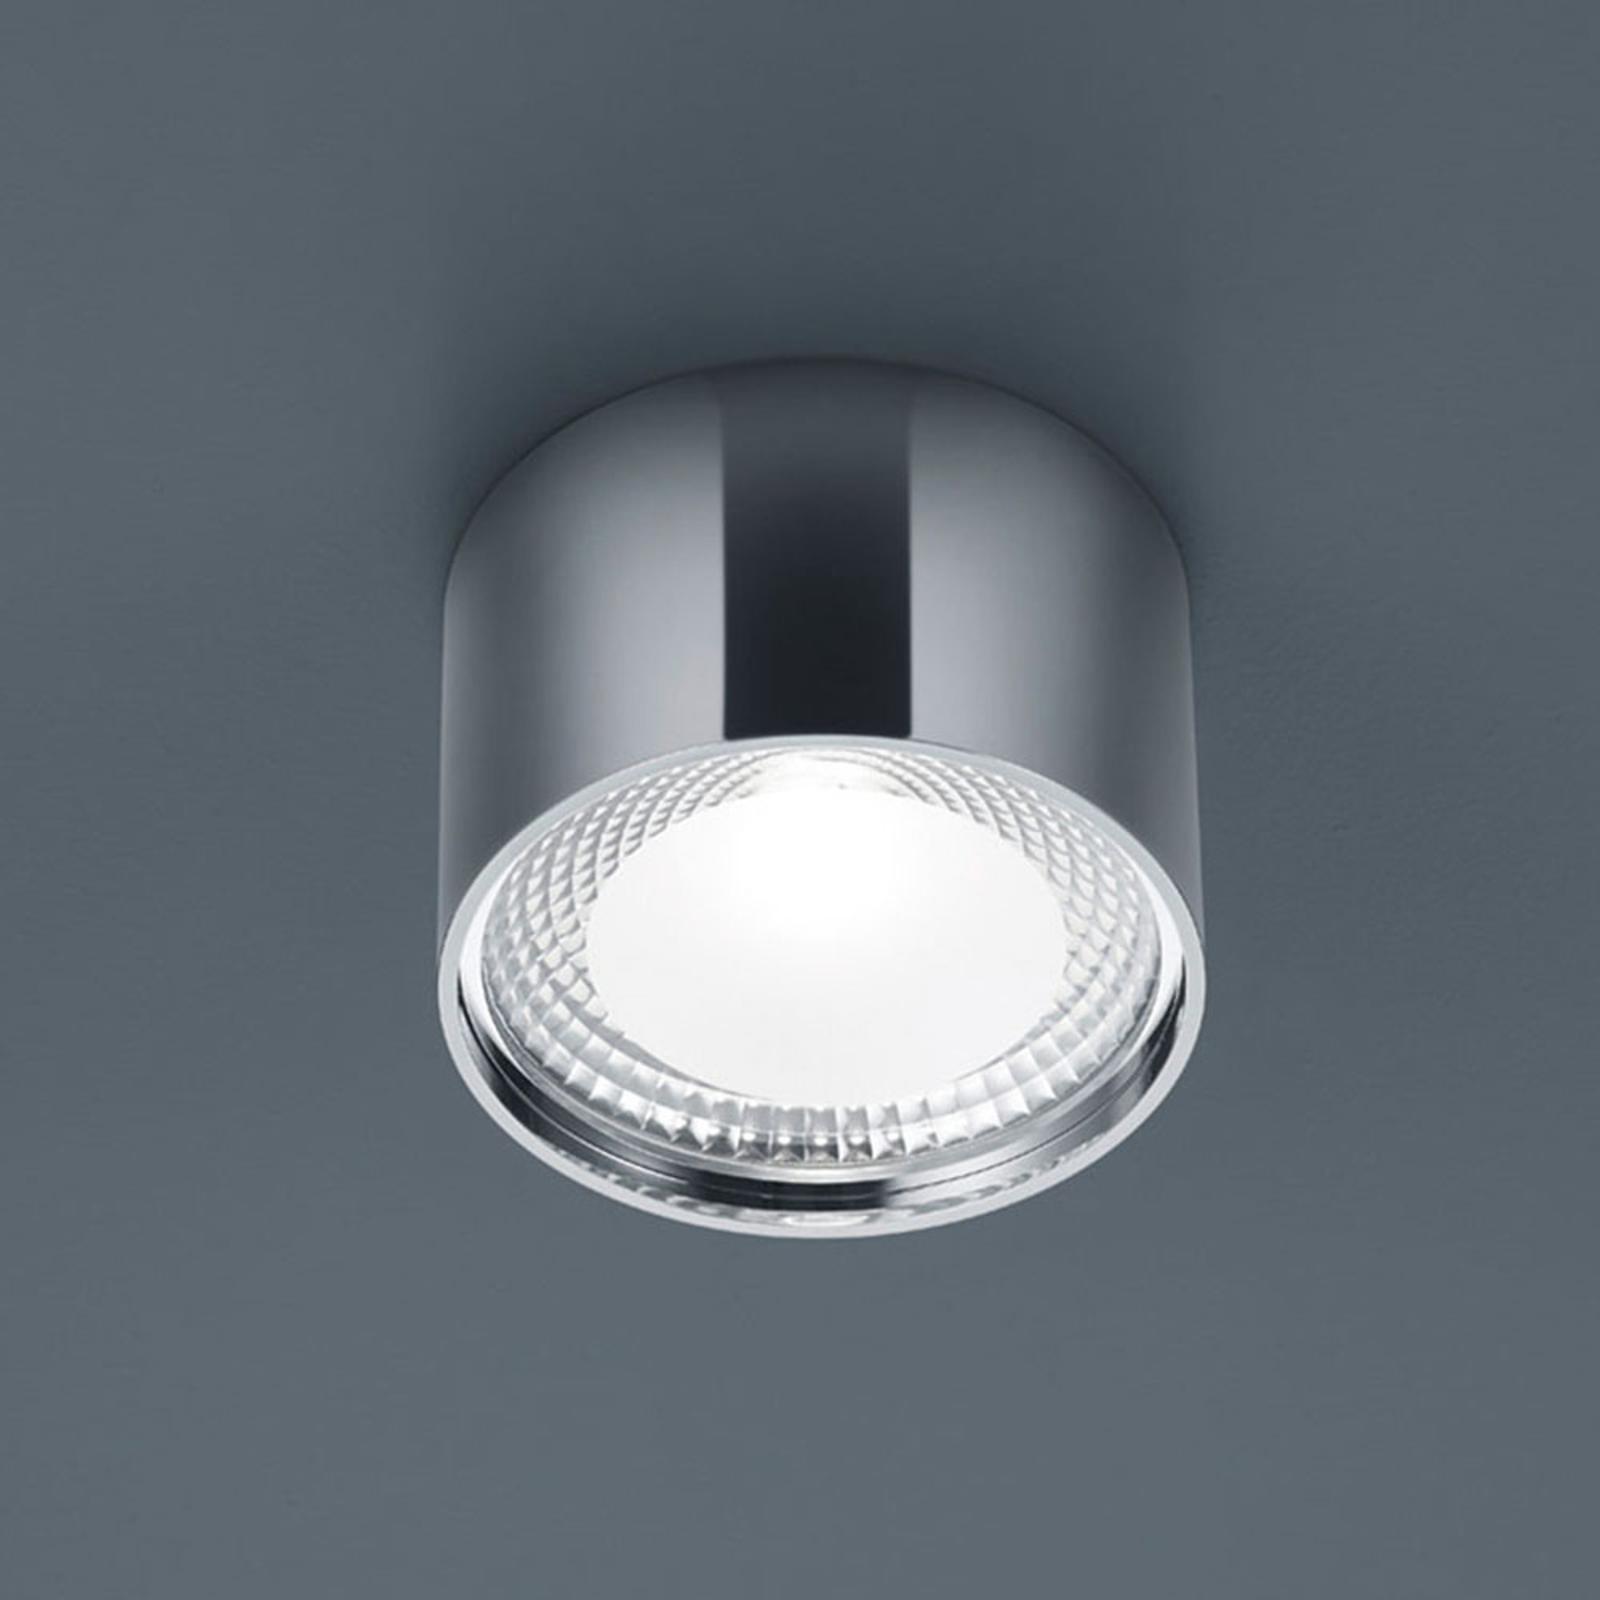 Helestra Kari lampa sufitowa LED, okrągła, chrom